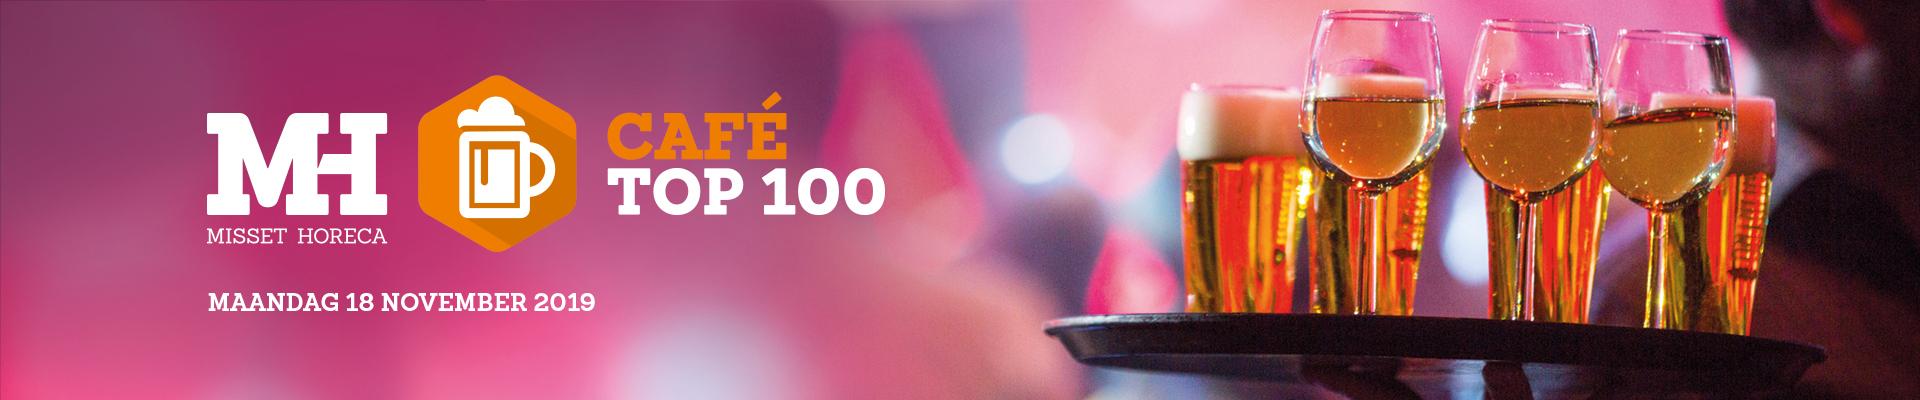 Misset Horeca Café Top 100 2019